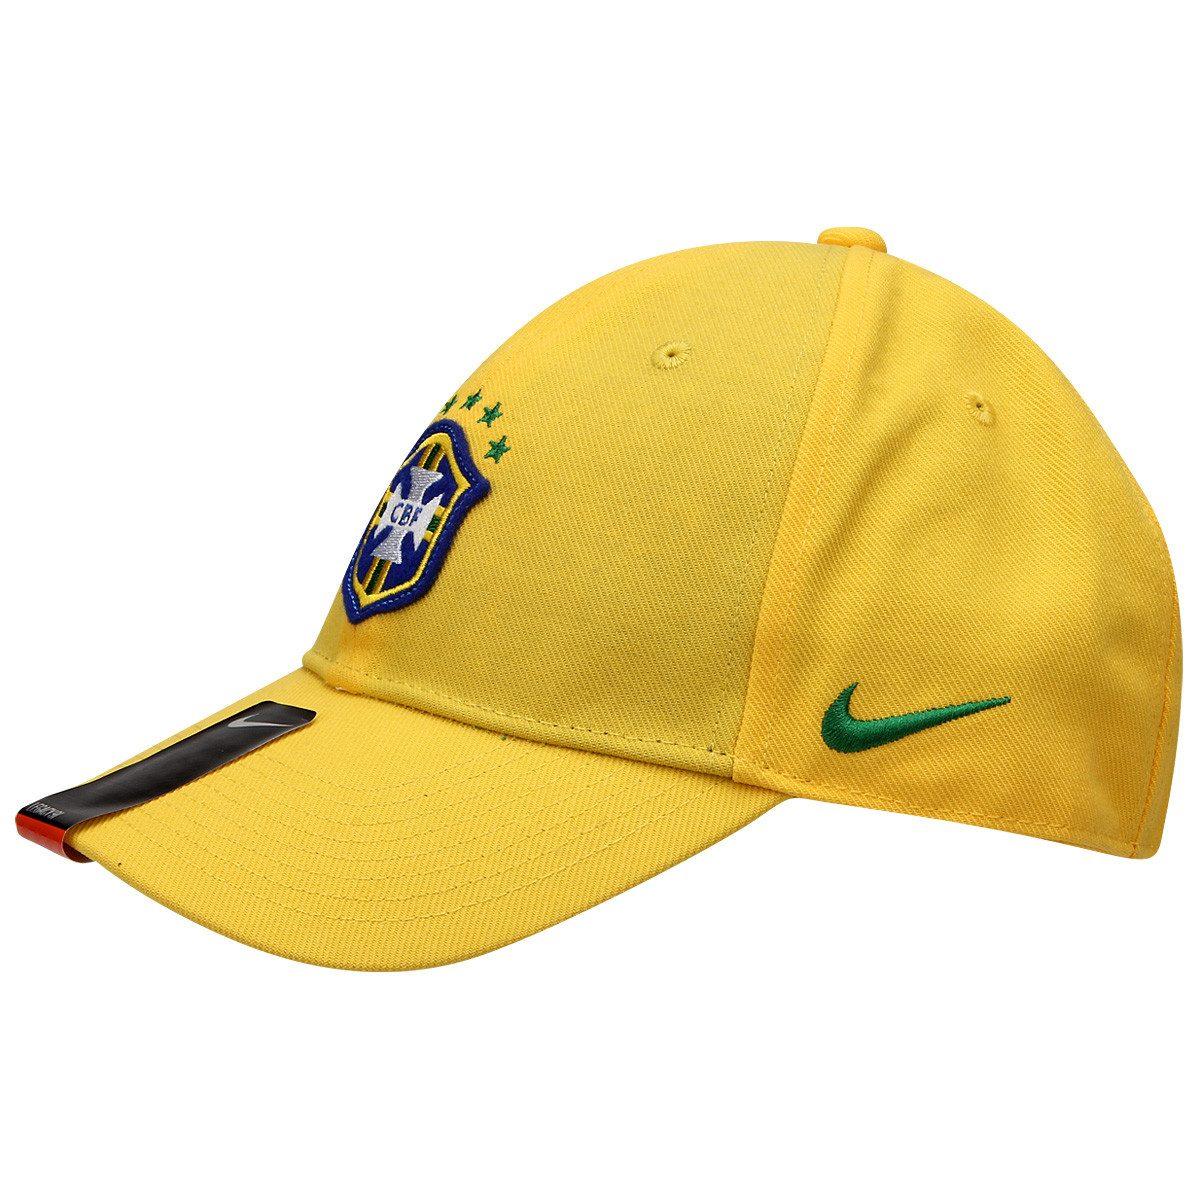 83eee635c0 boné nike seleção brasileira cbf core kit adulto unissex. Carregando zoom.